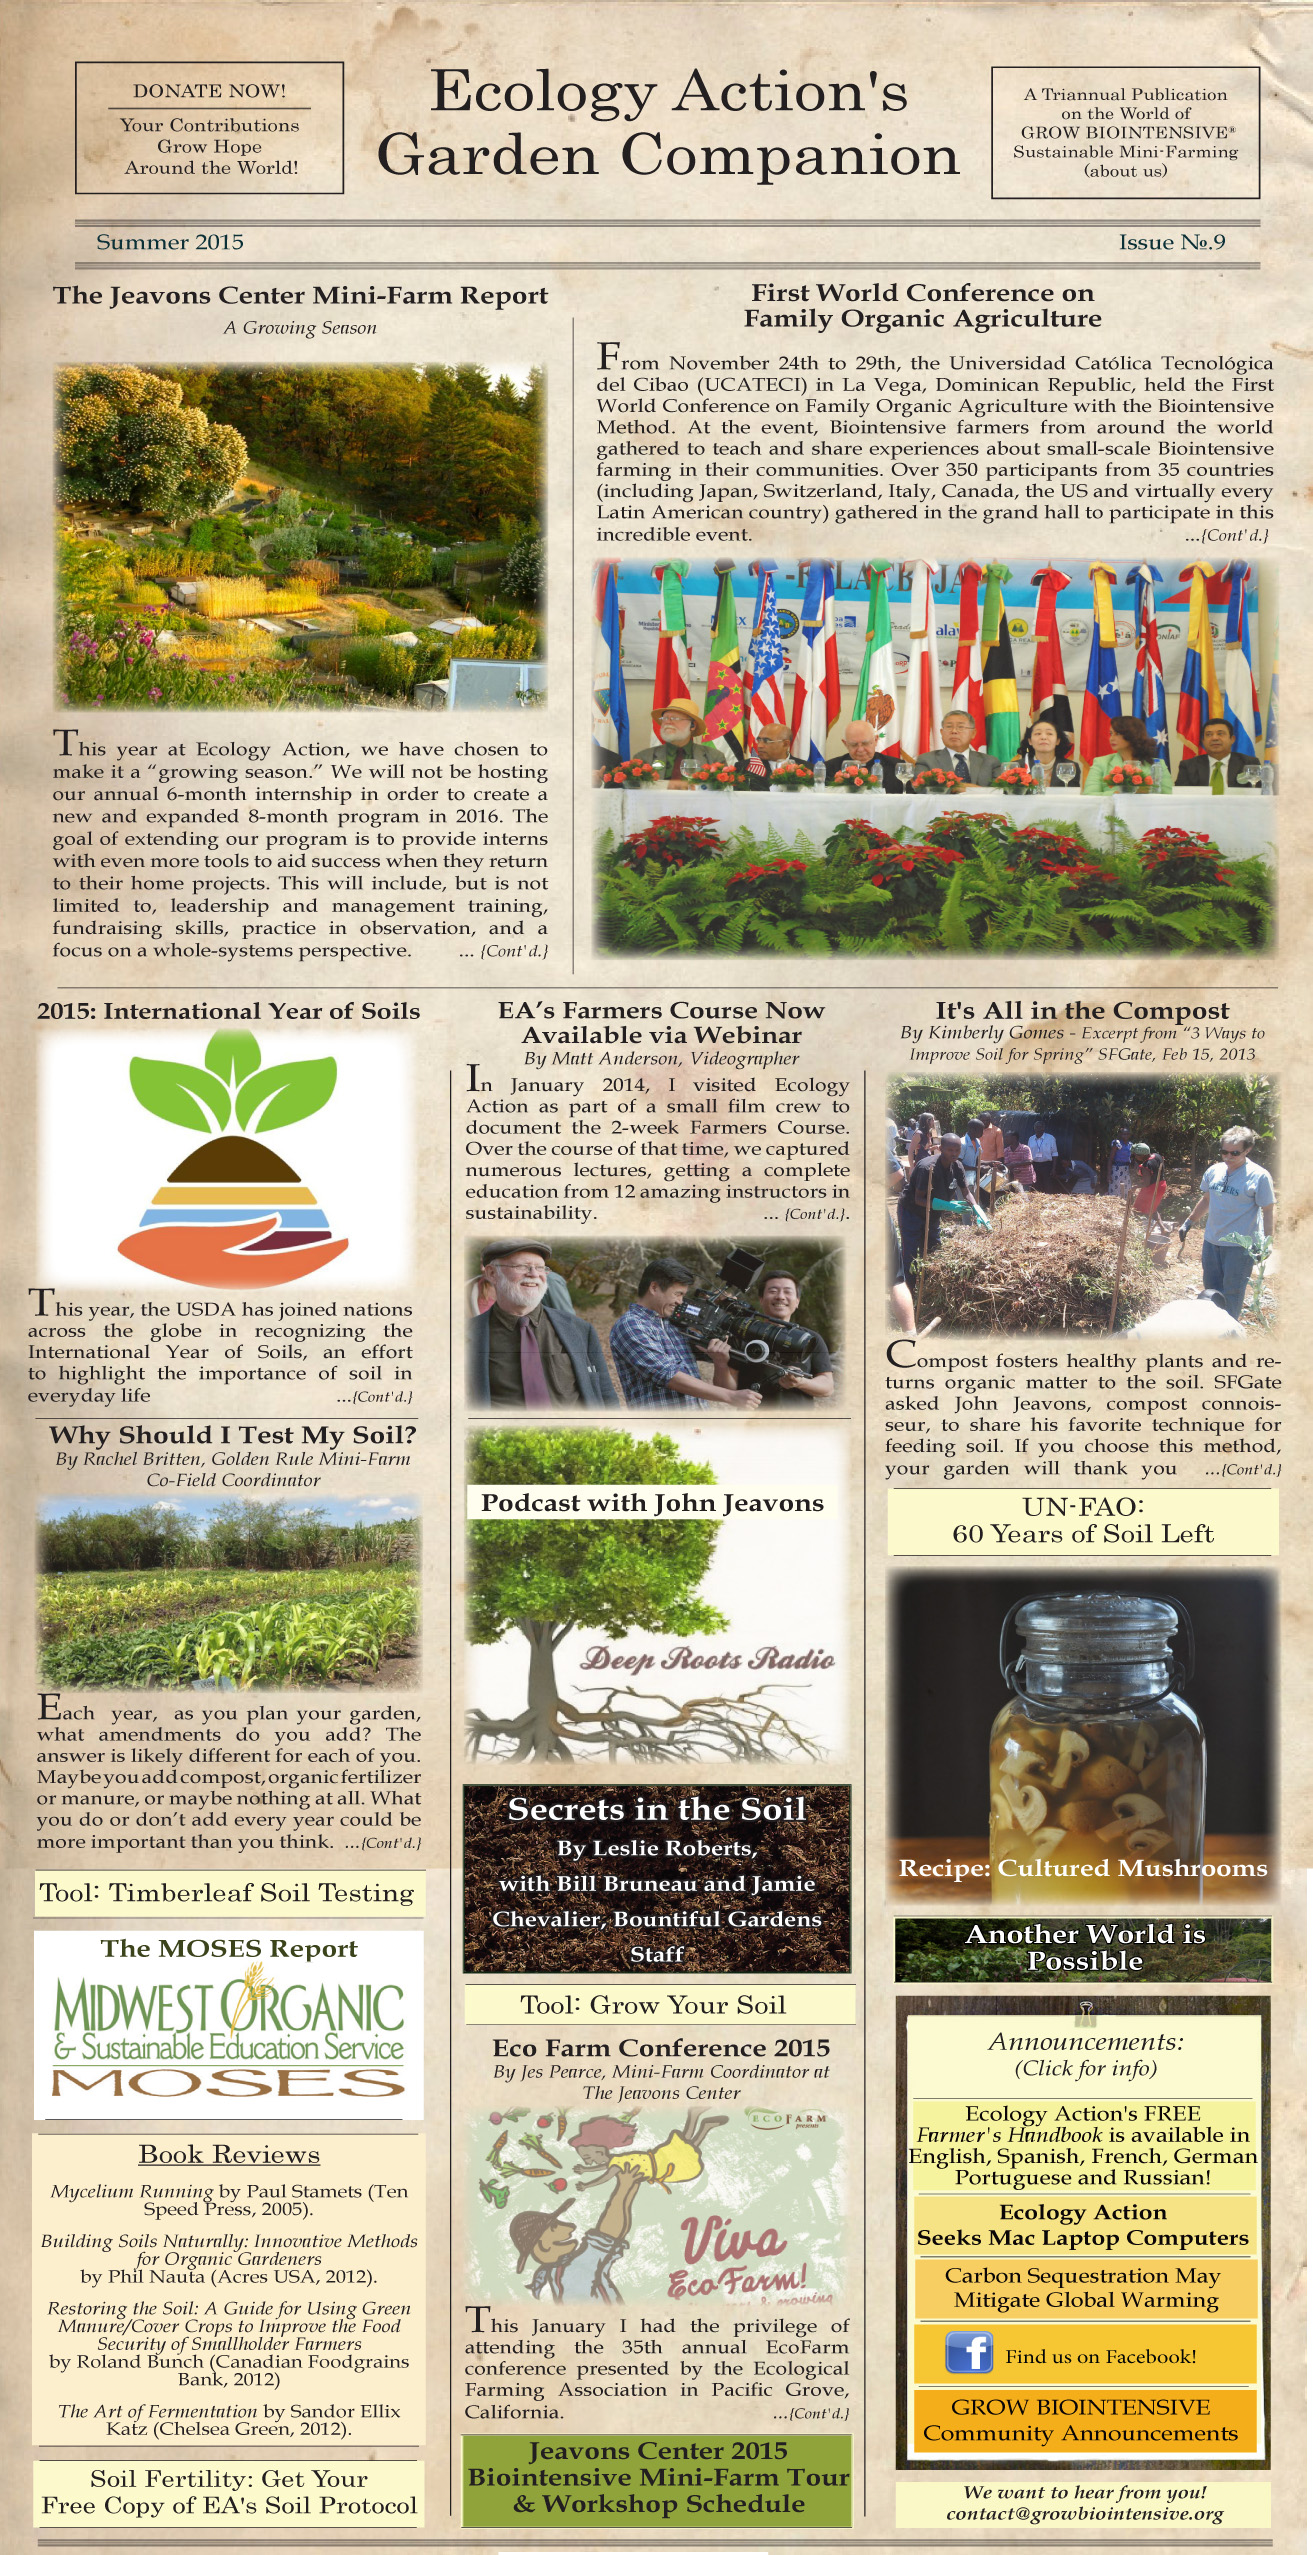 ecology action enews no 9